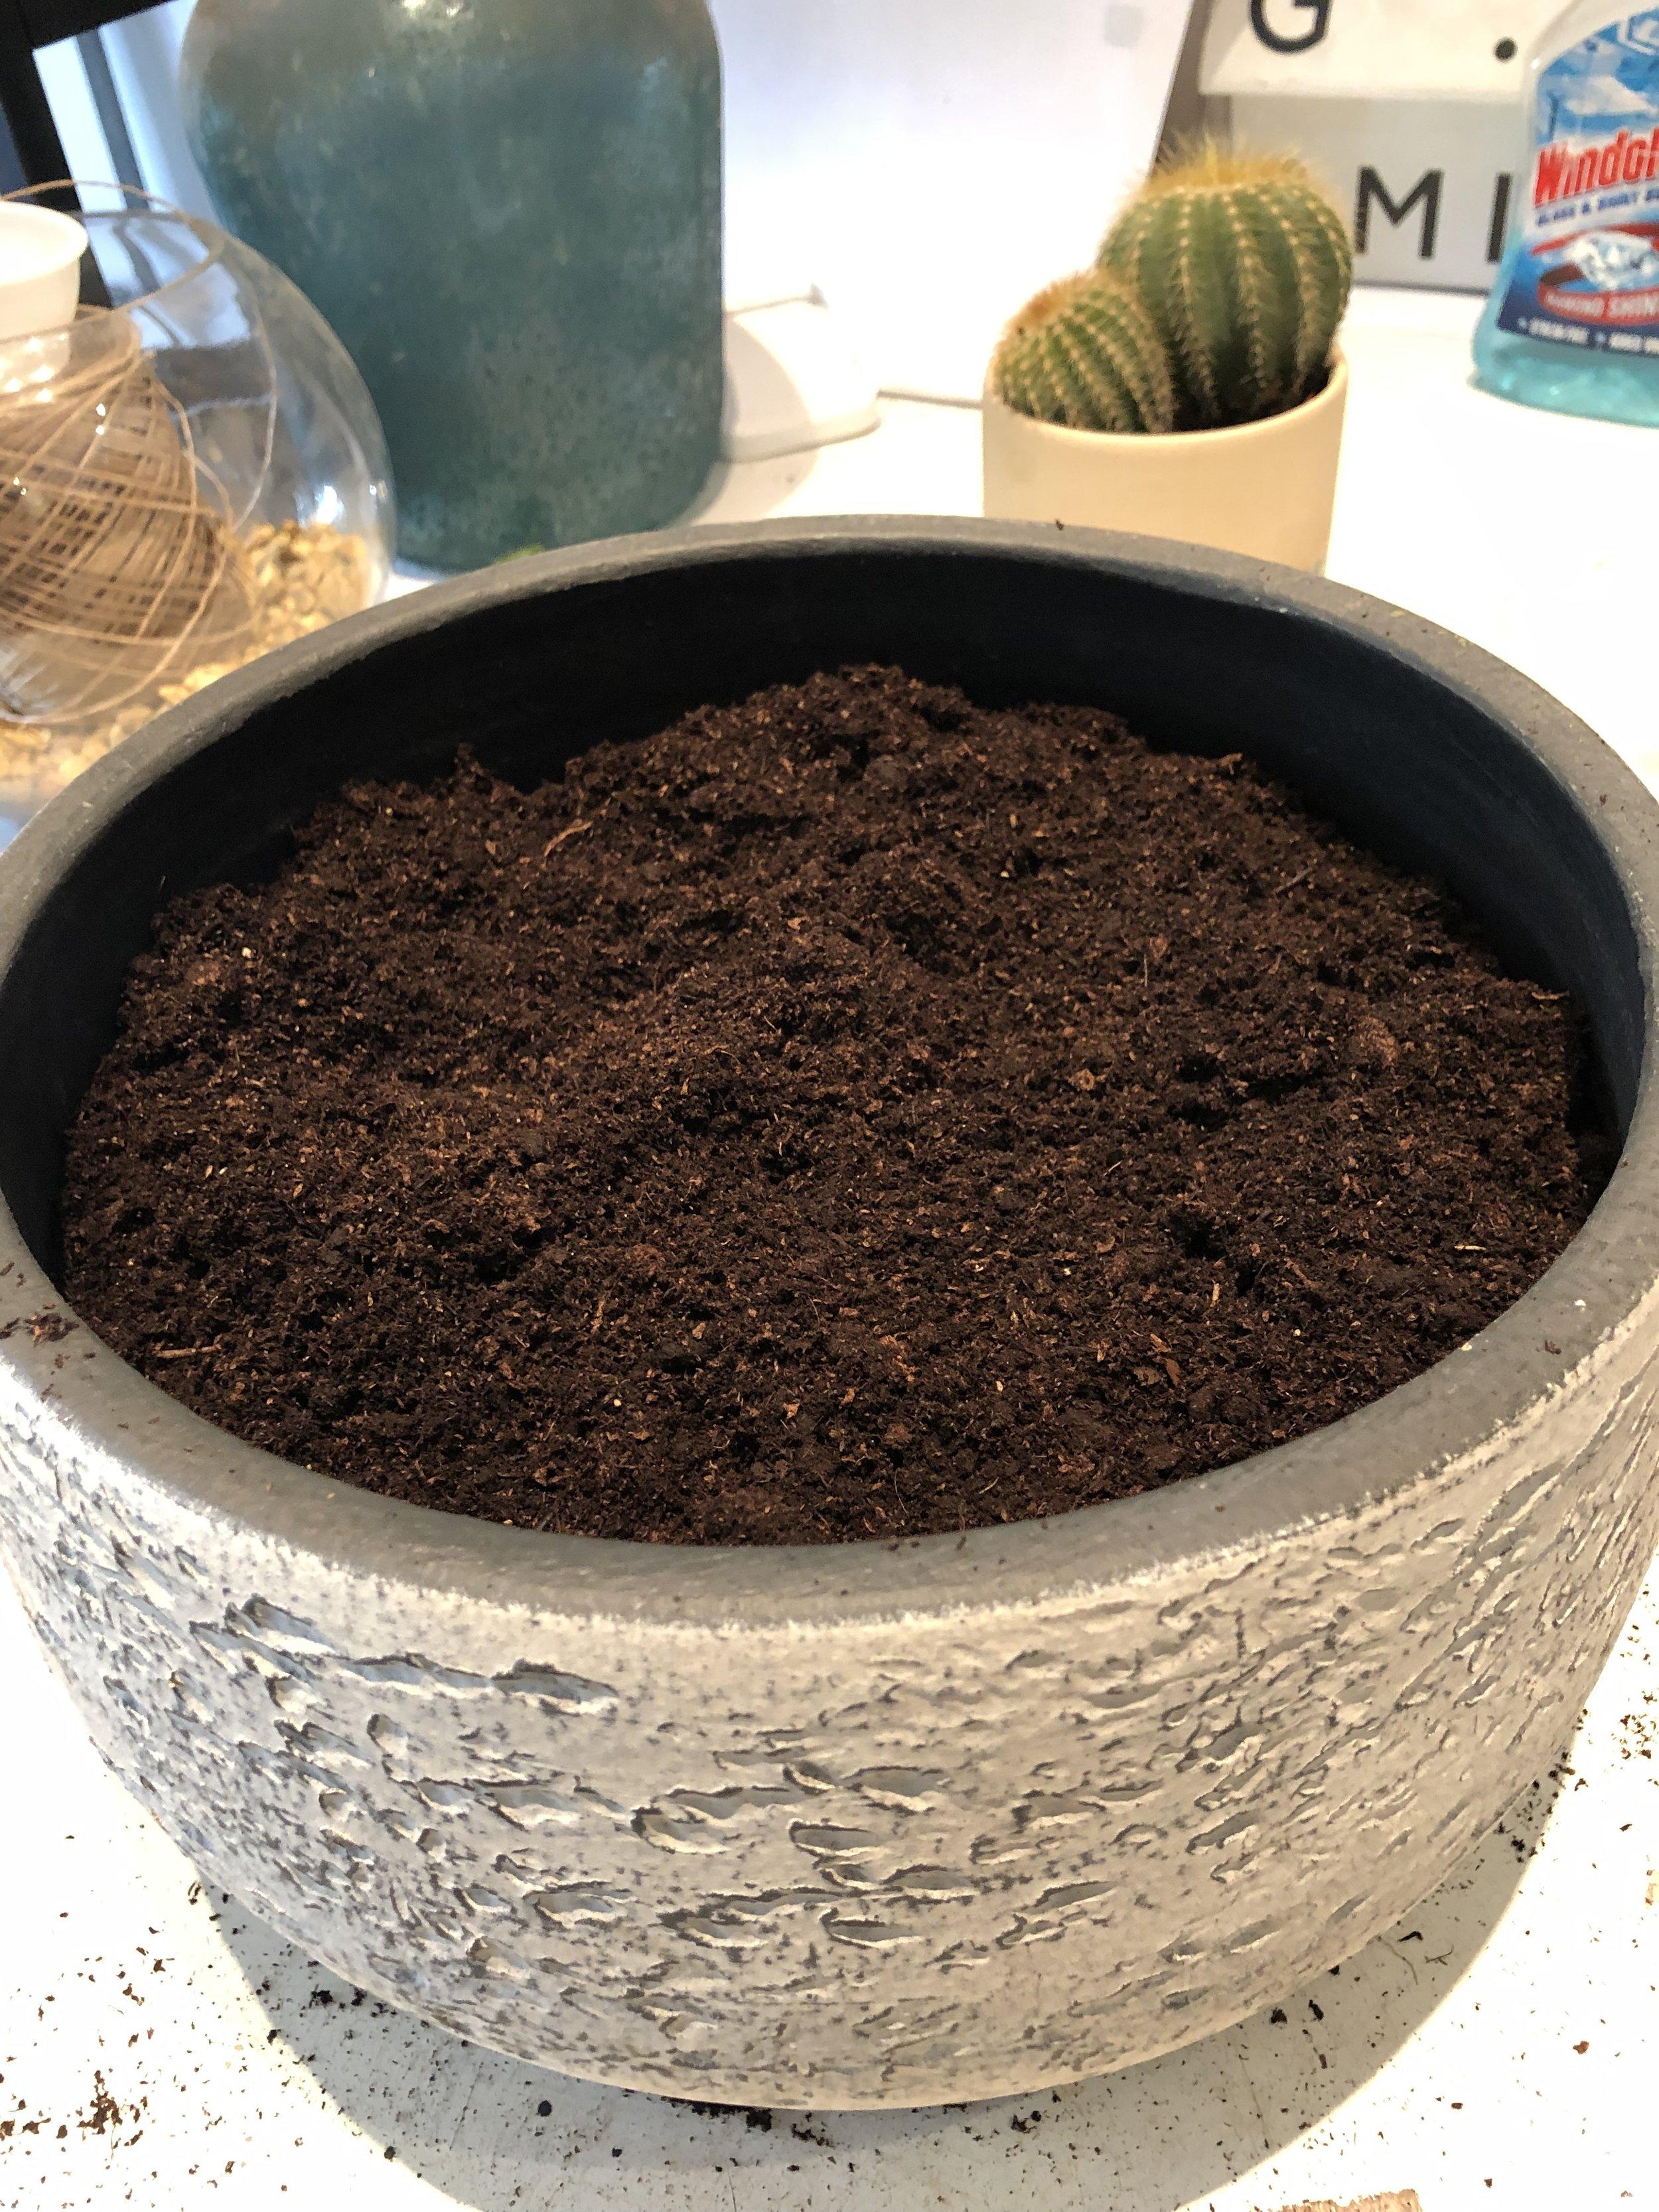 Add a compost mix